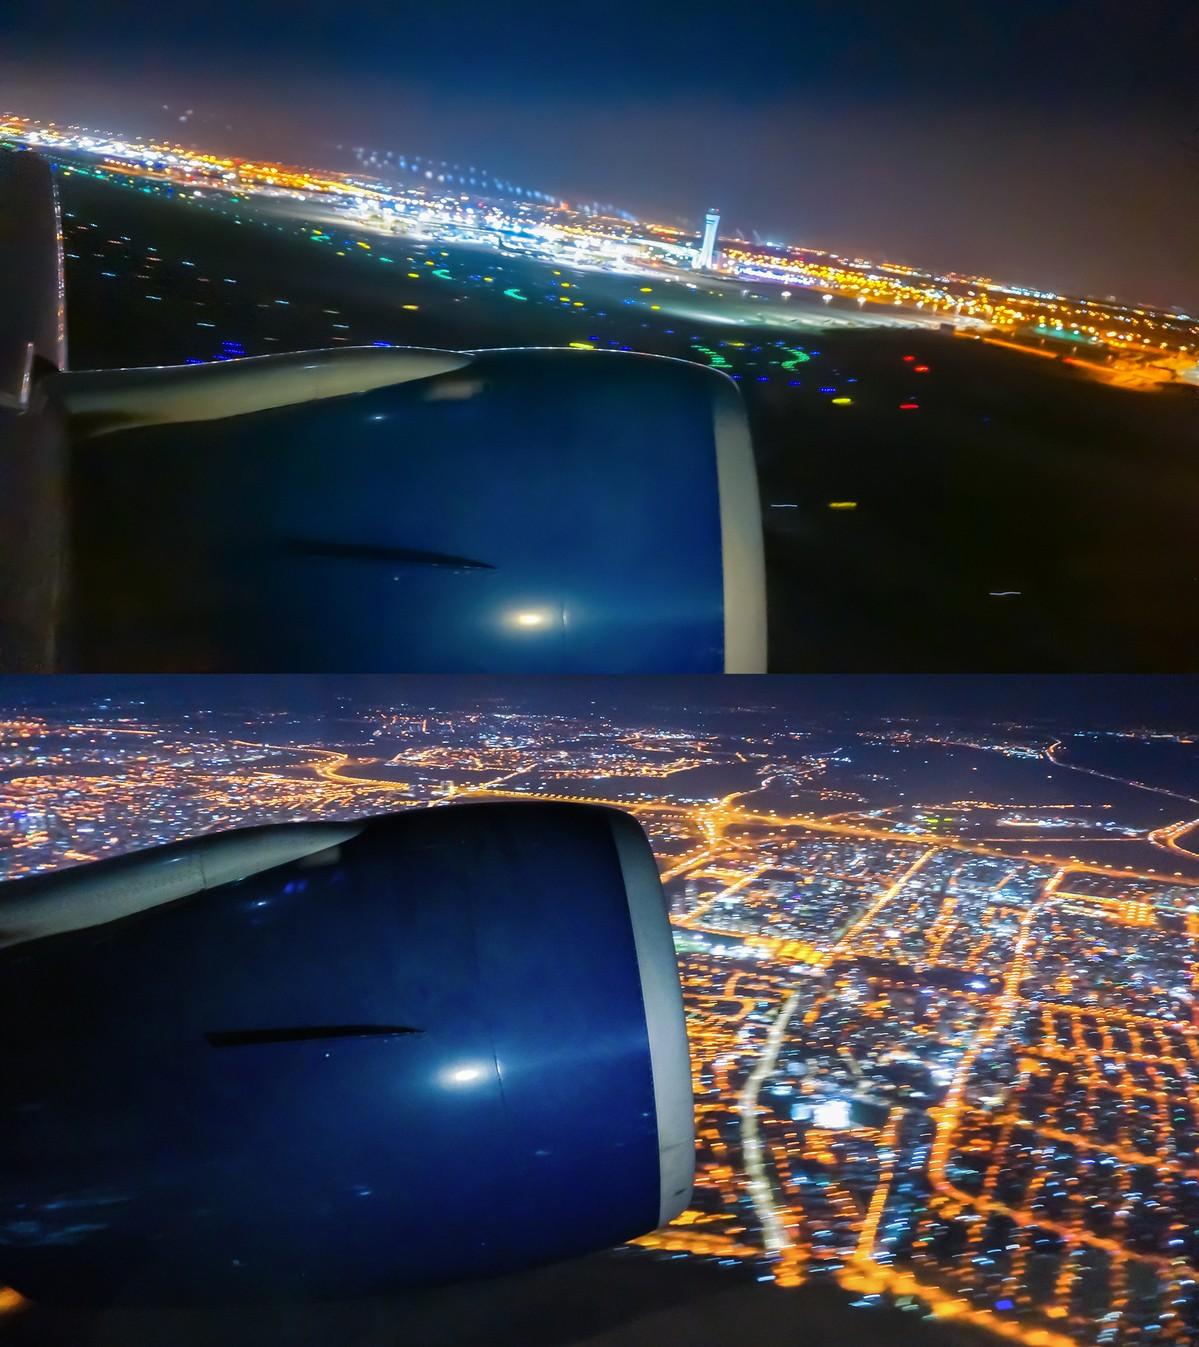 Re: [原创]【 寰球十万八千里 | 中集 | 耶路撒冷 】 BOEING 777-300ER G-STBB 空中